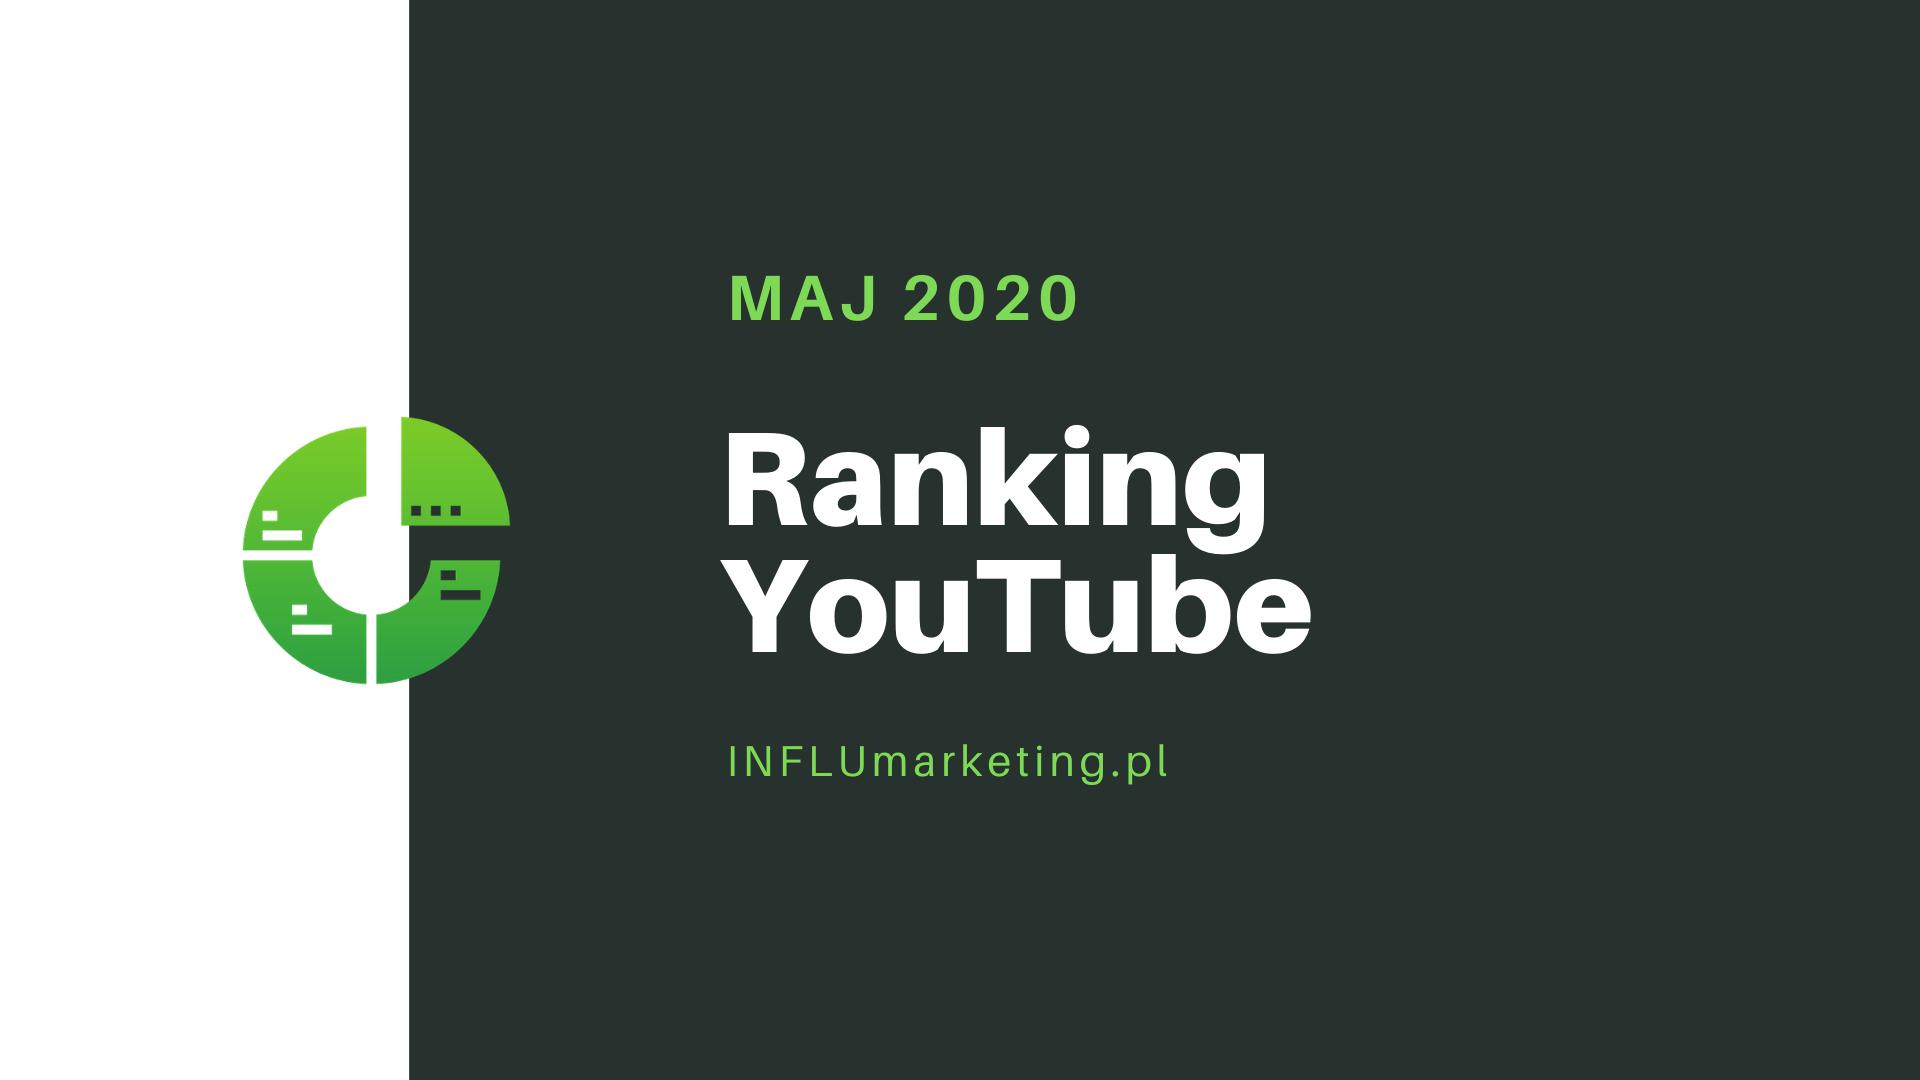 ranking youtube polska 2020 cover photo maj